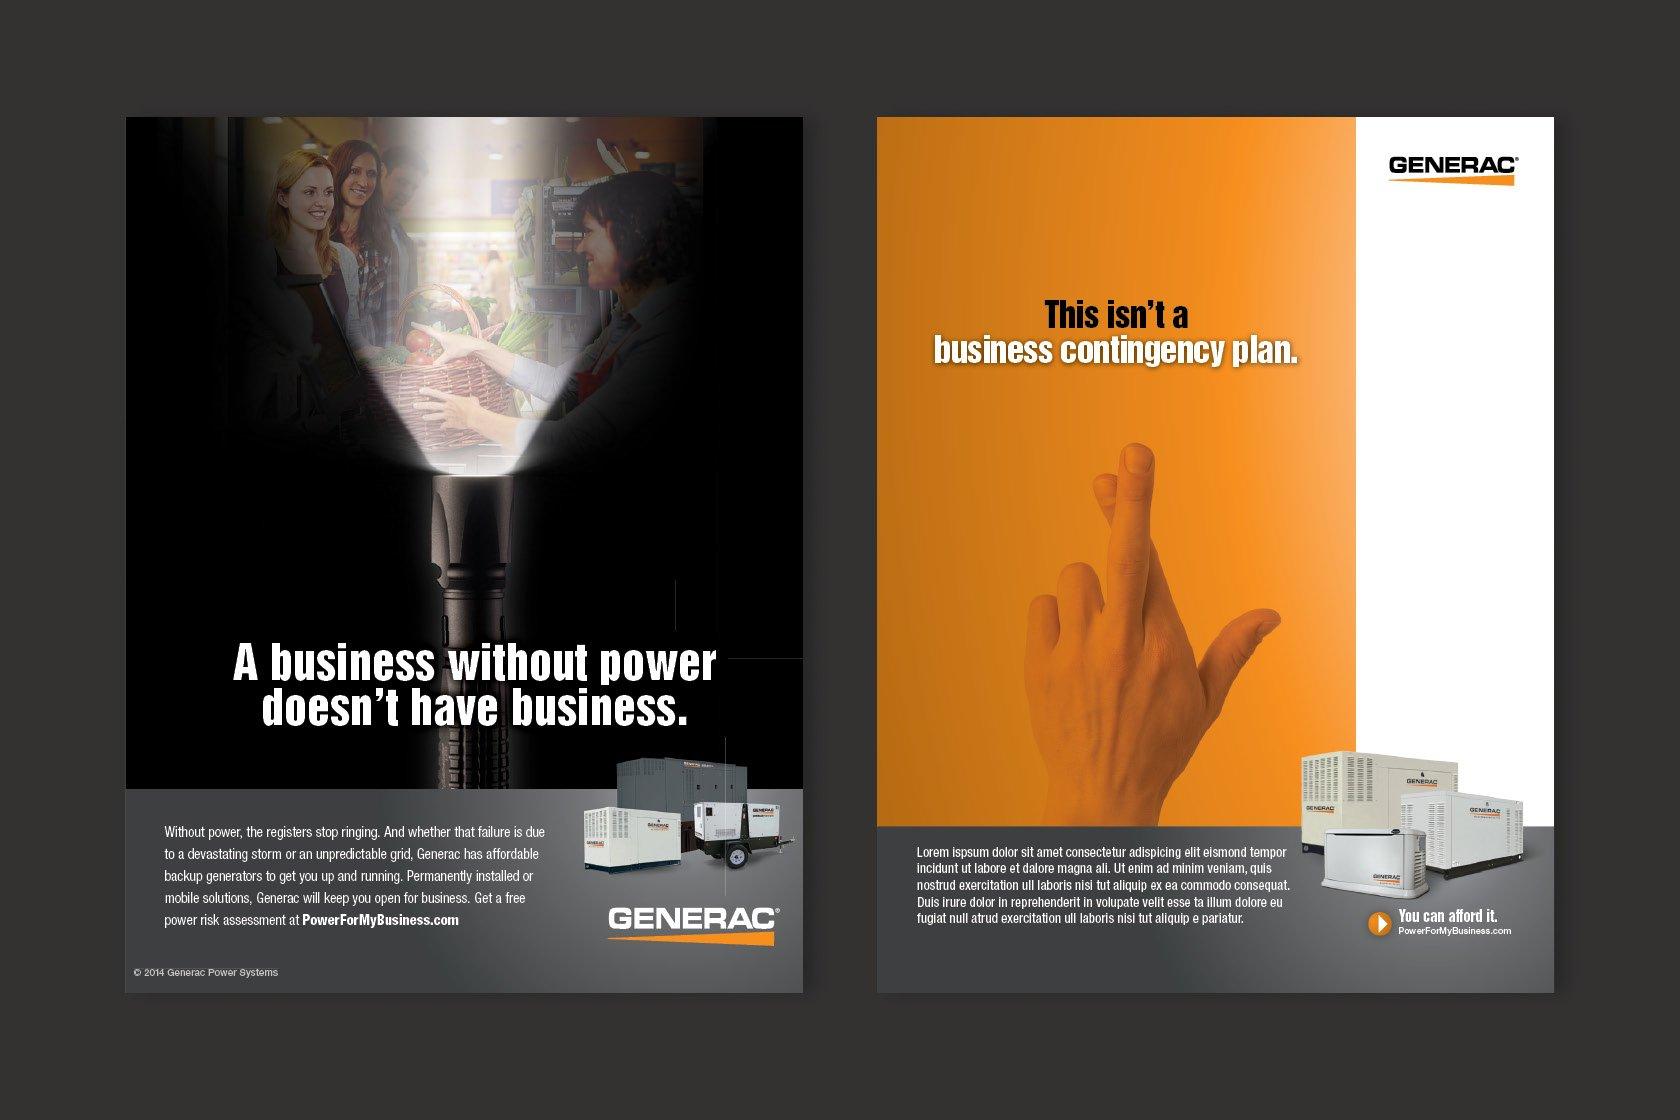 generac print advertisements